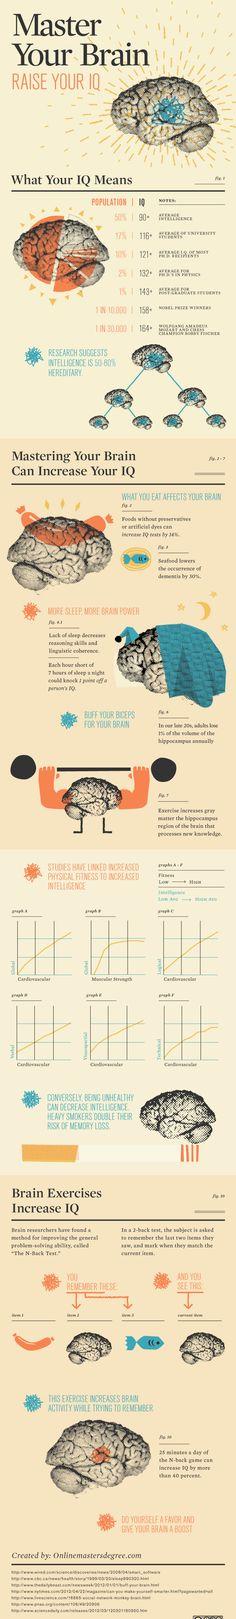 Master your Brain Power 2